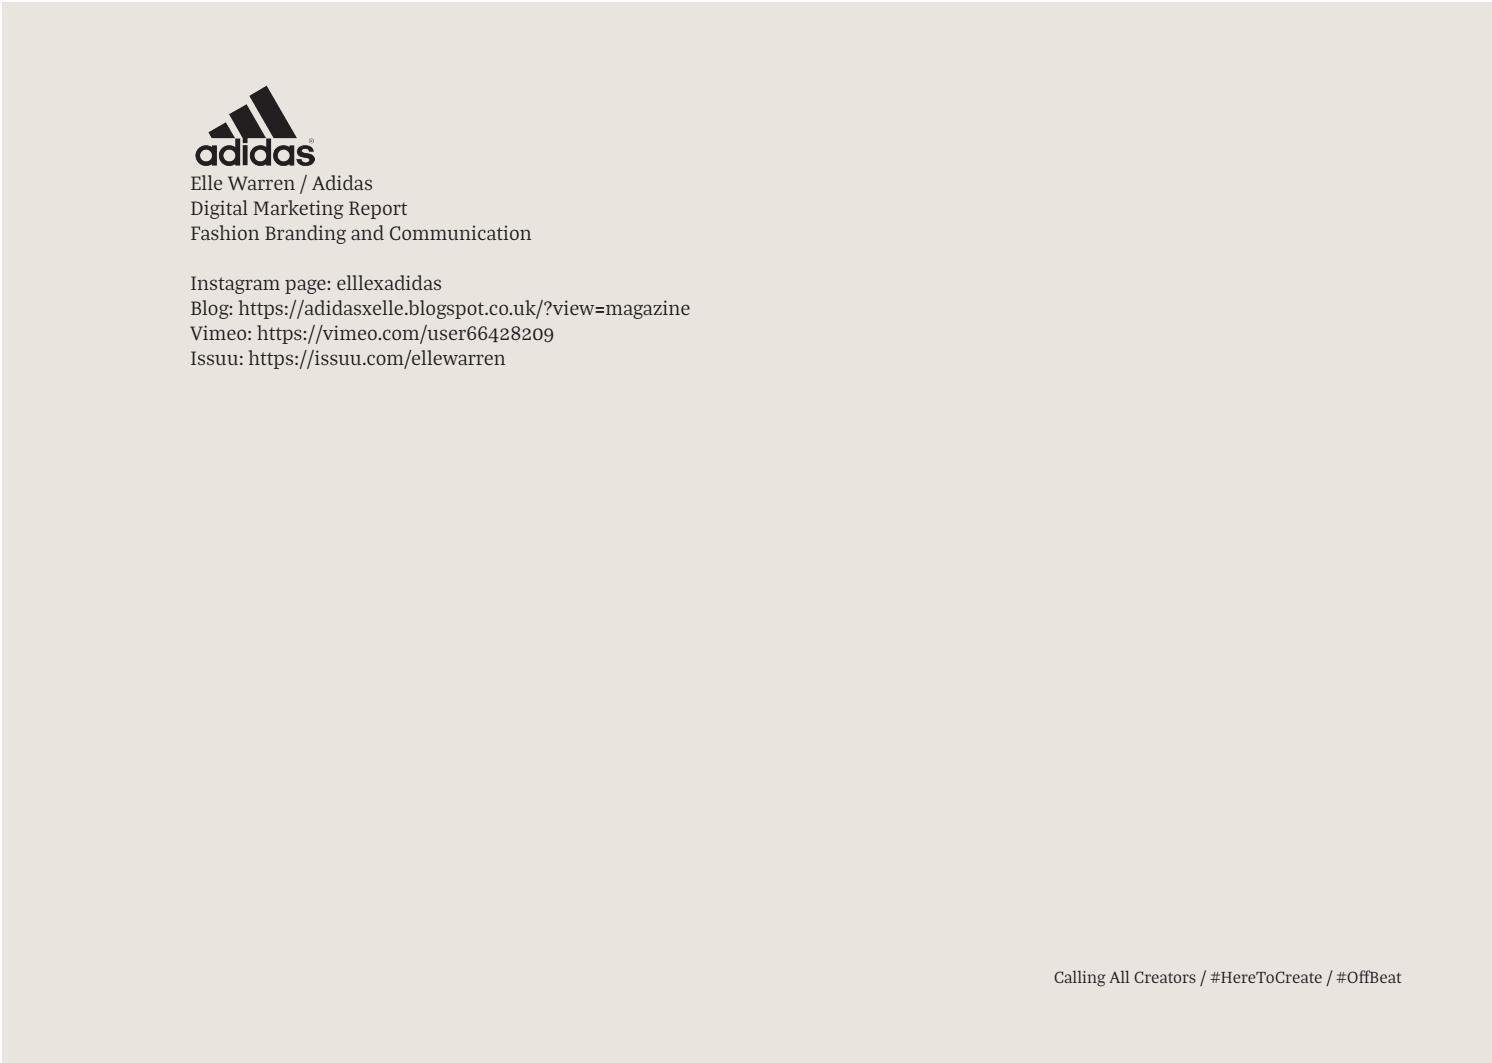 Adidas Marketing Report by elle warren - issuu fc37baa98051